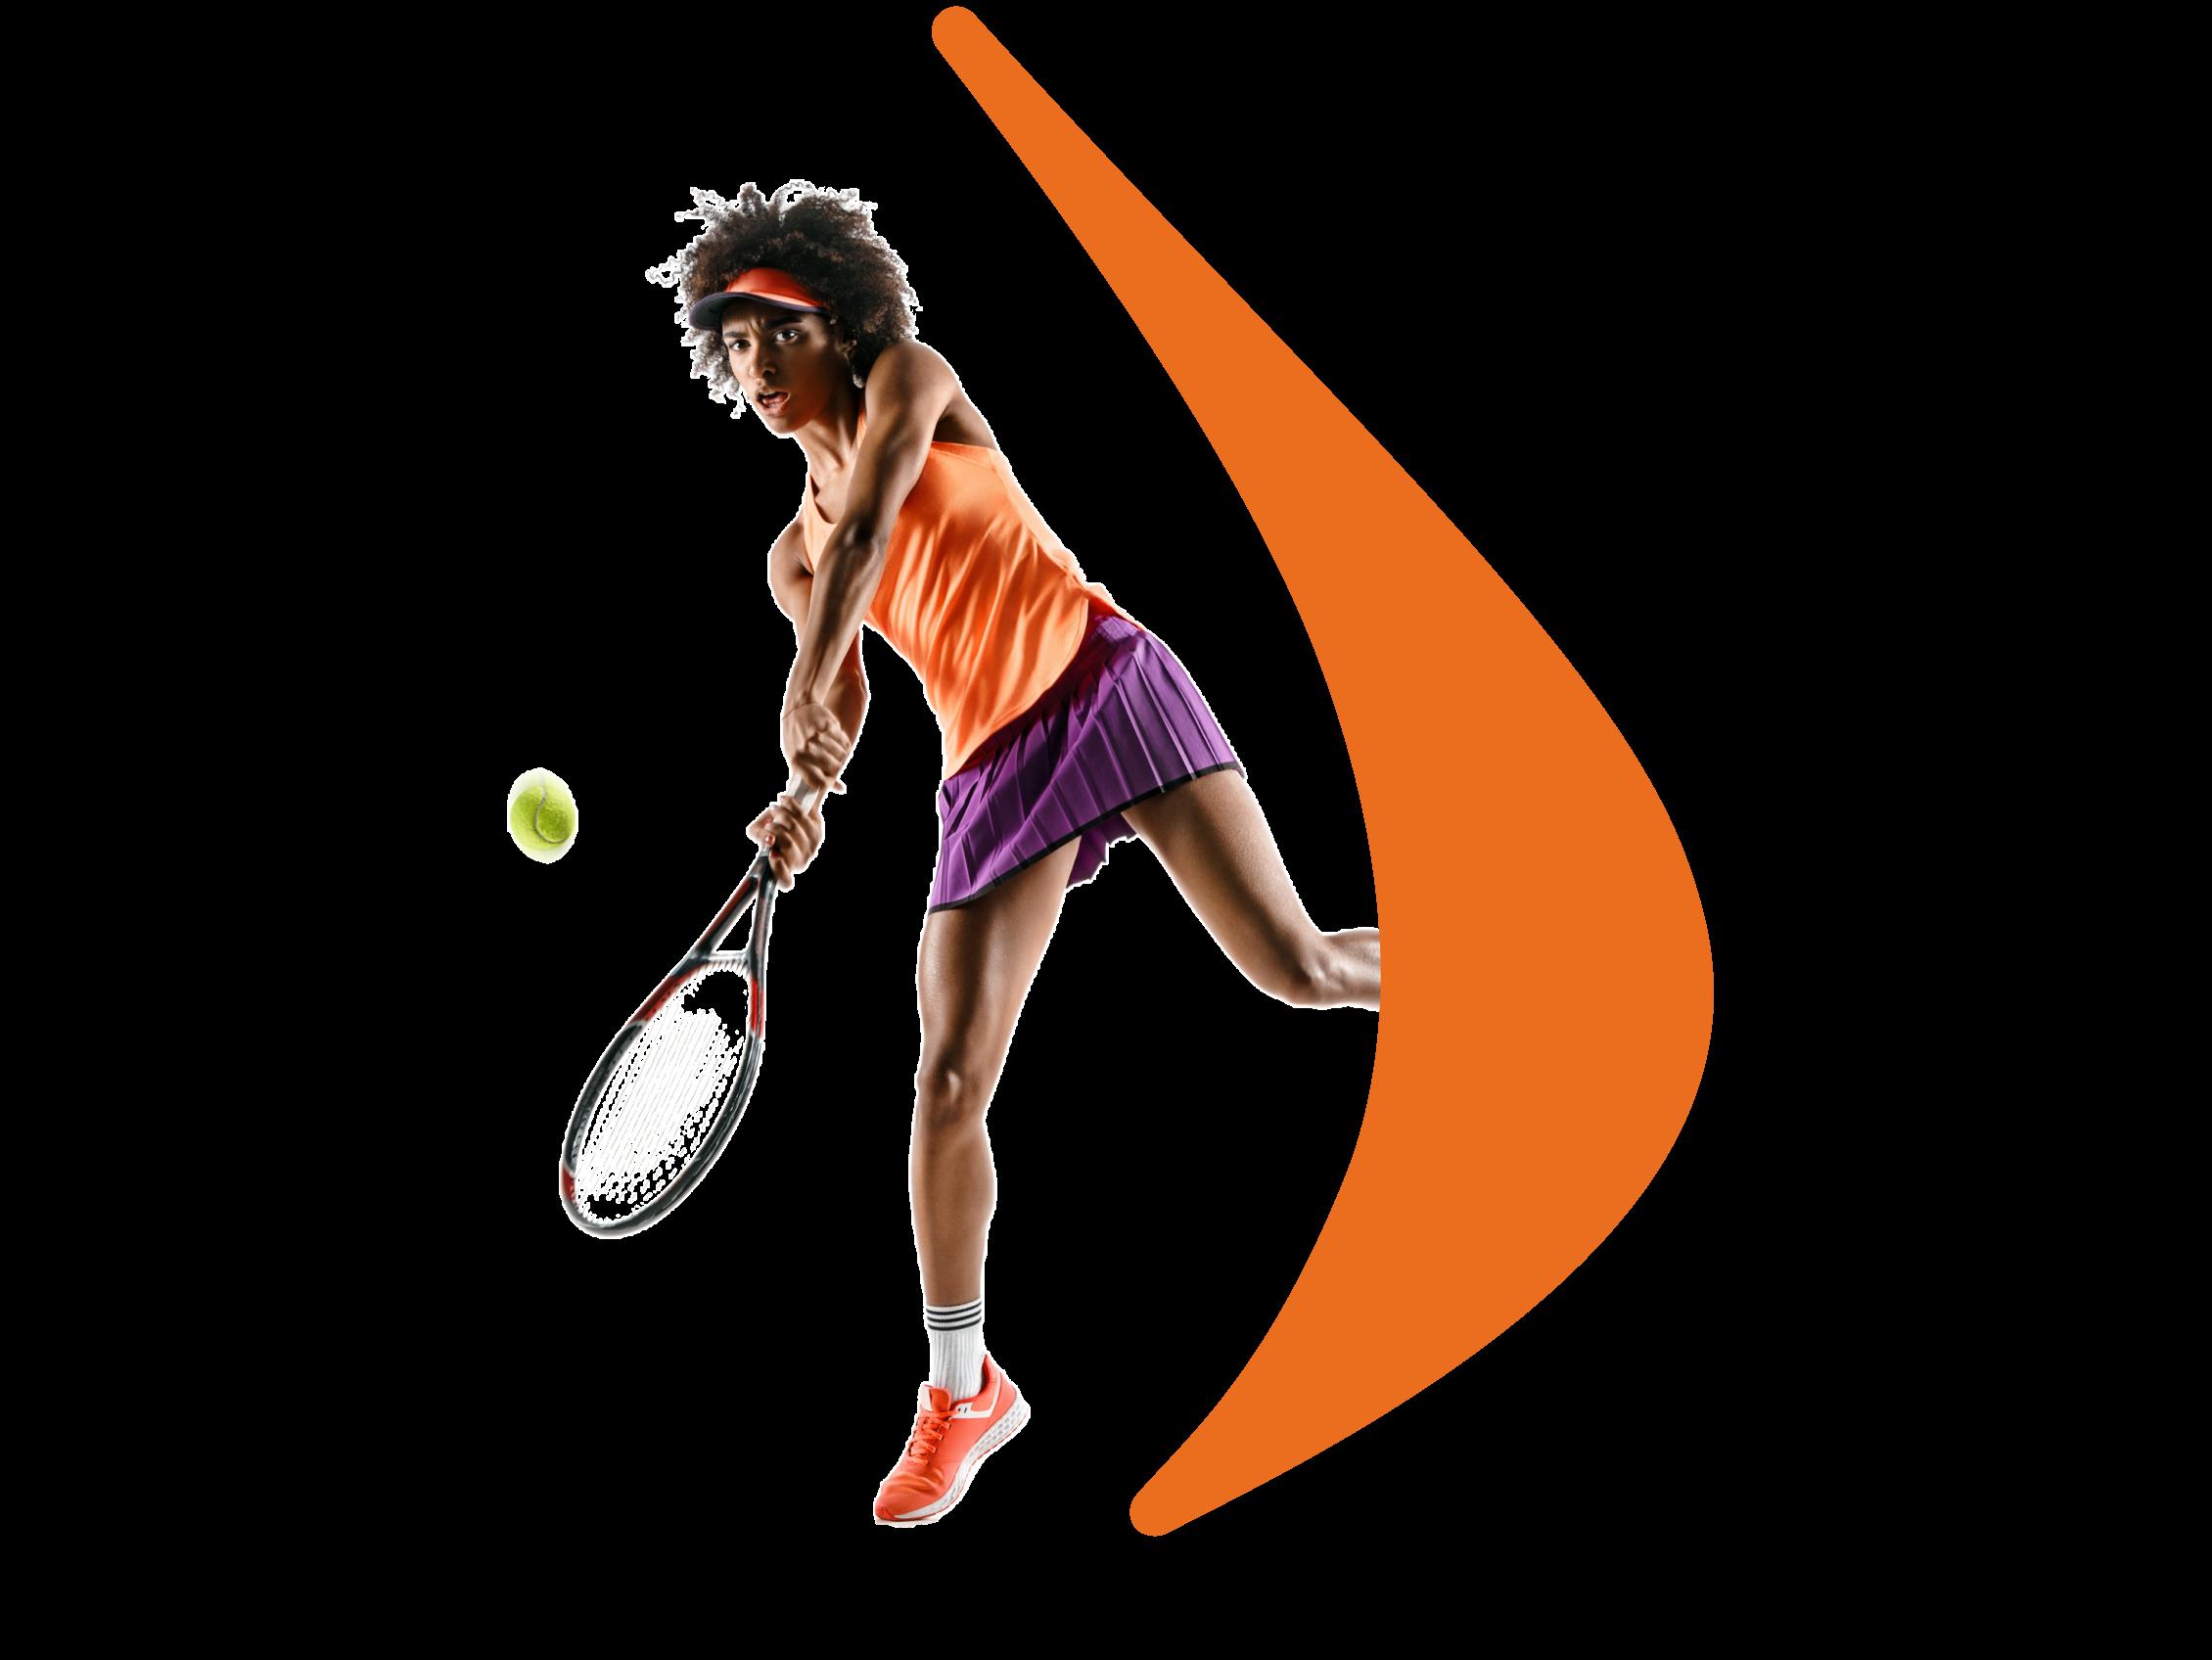 Tennis-Montage